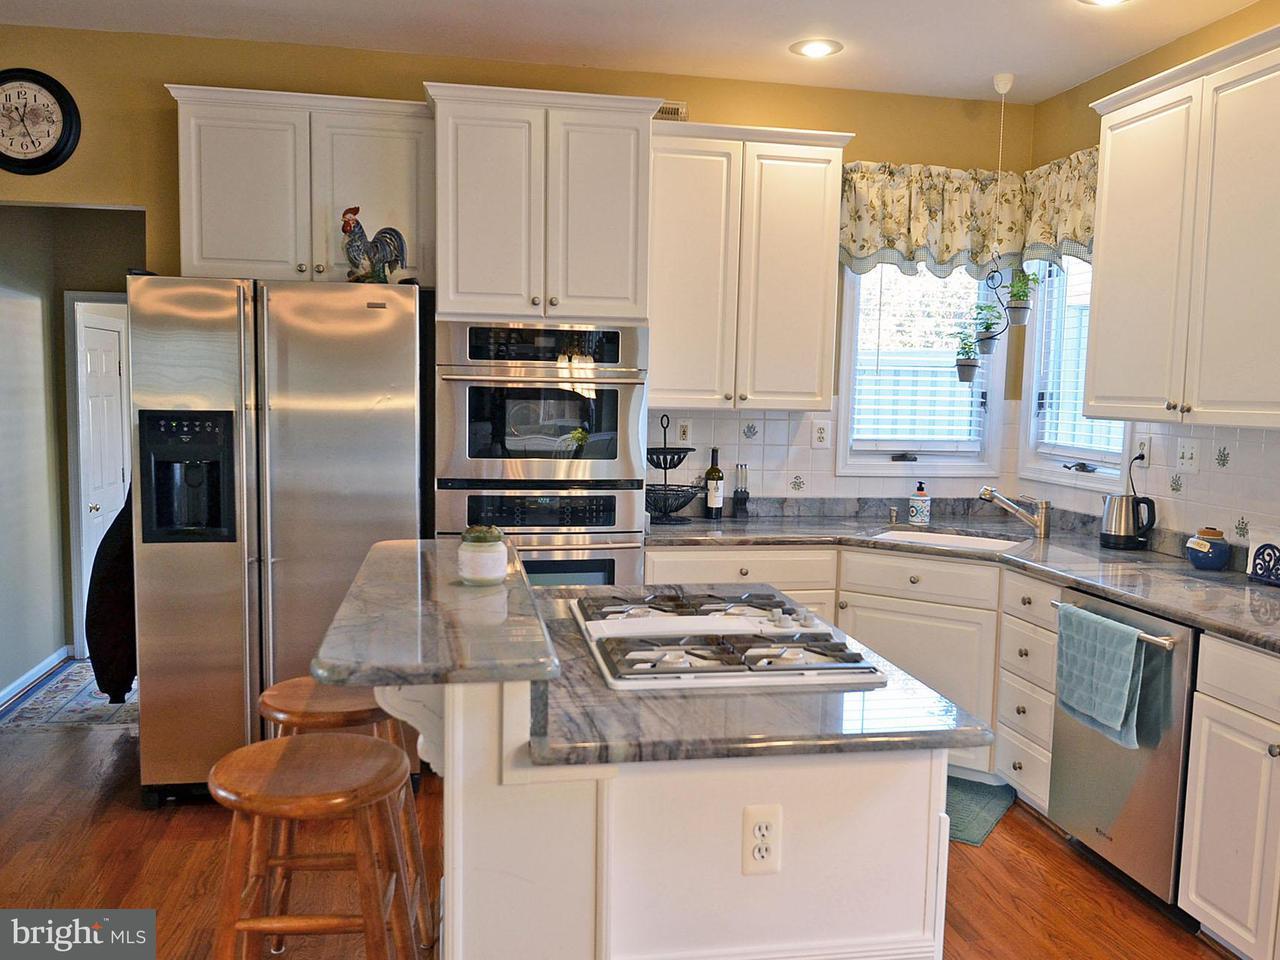 Additional photo for property listing at 15075 Stillfield Place 15075 Stillfield Place Centreville, Βιρτζινια 20120 Ηνωμενεσ Πολιτειεσ